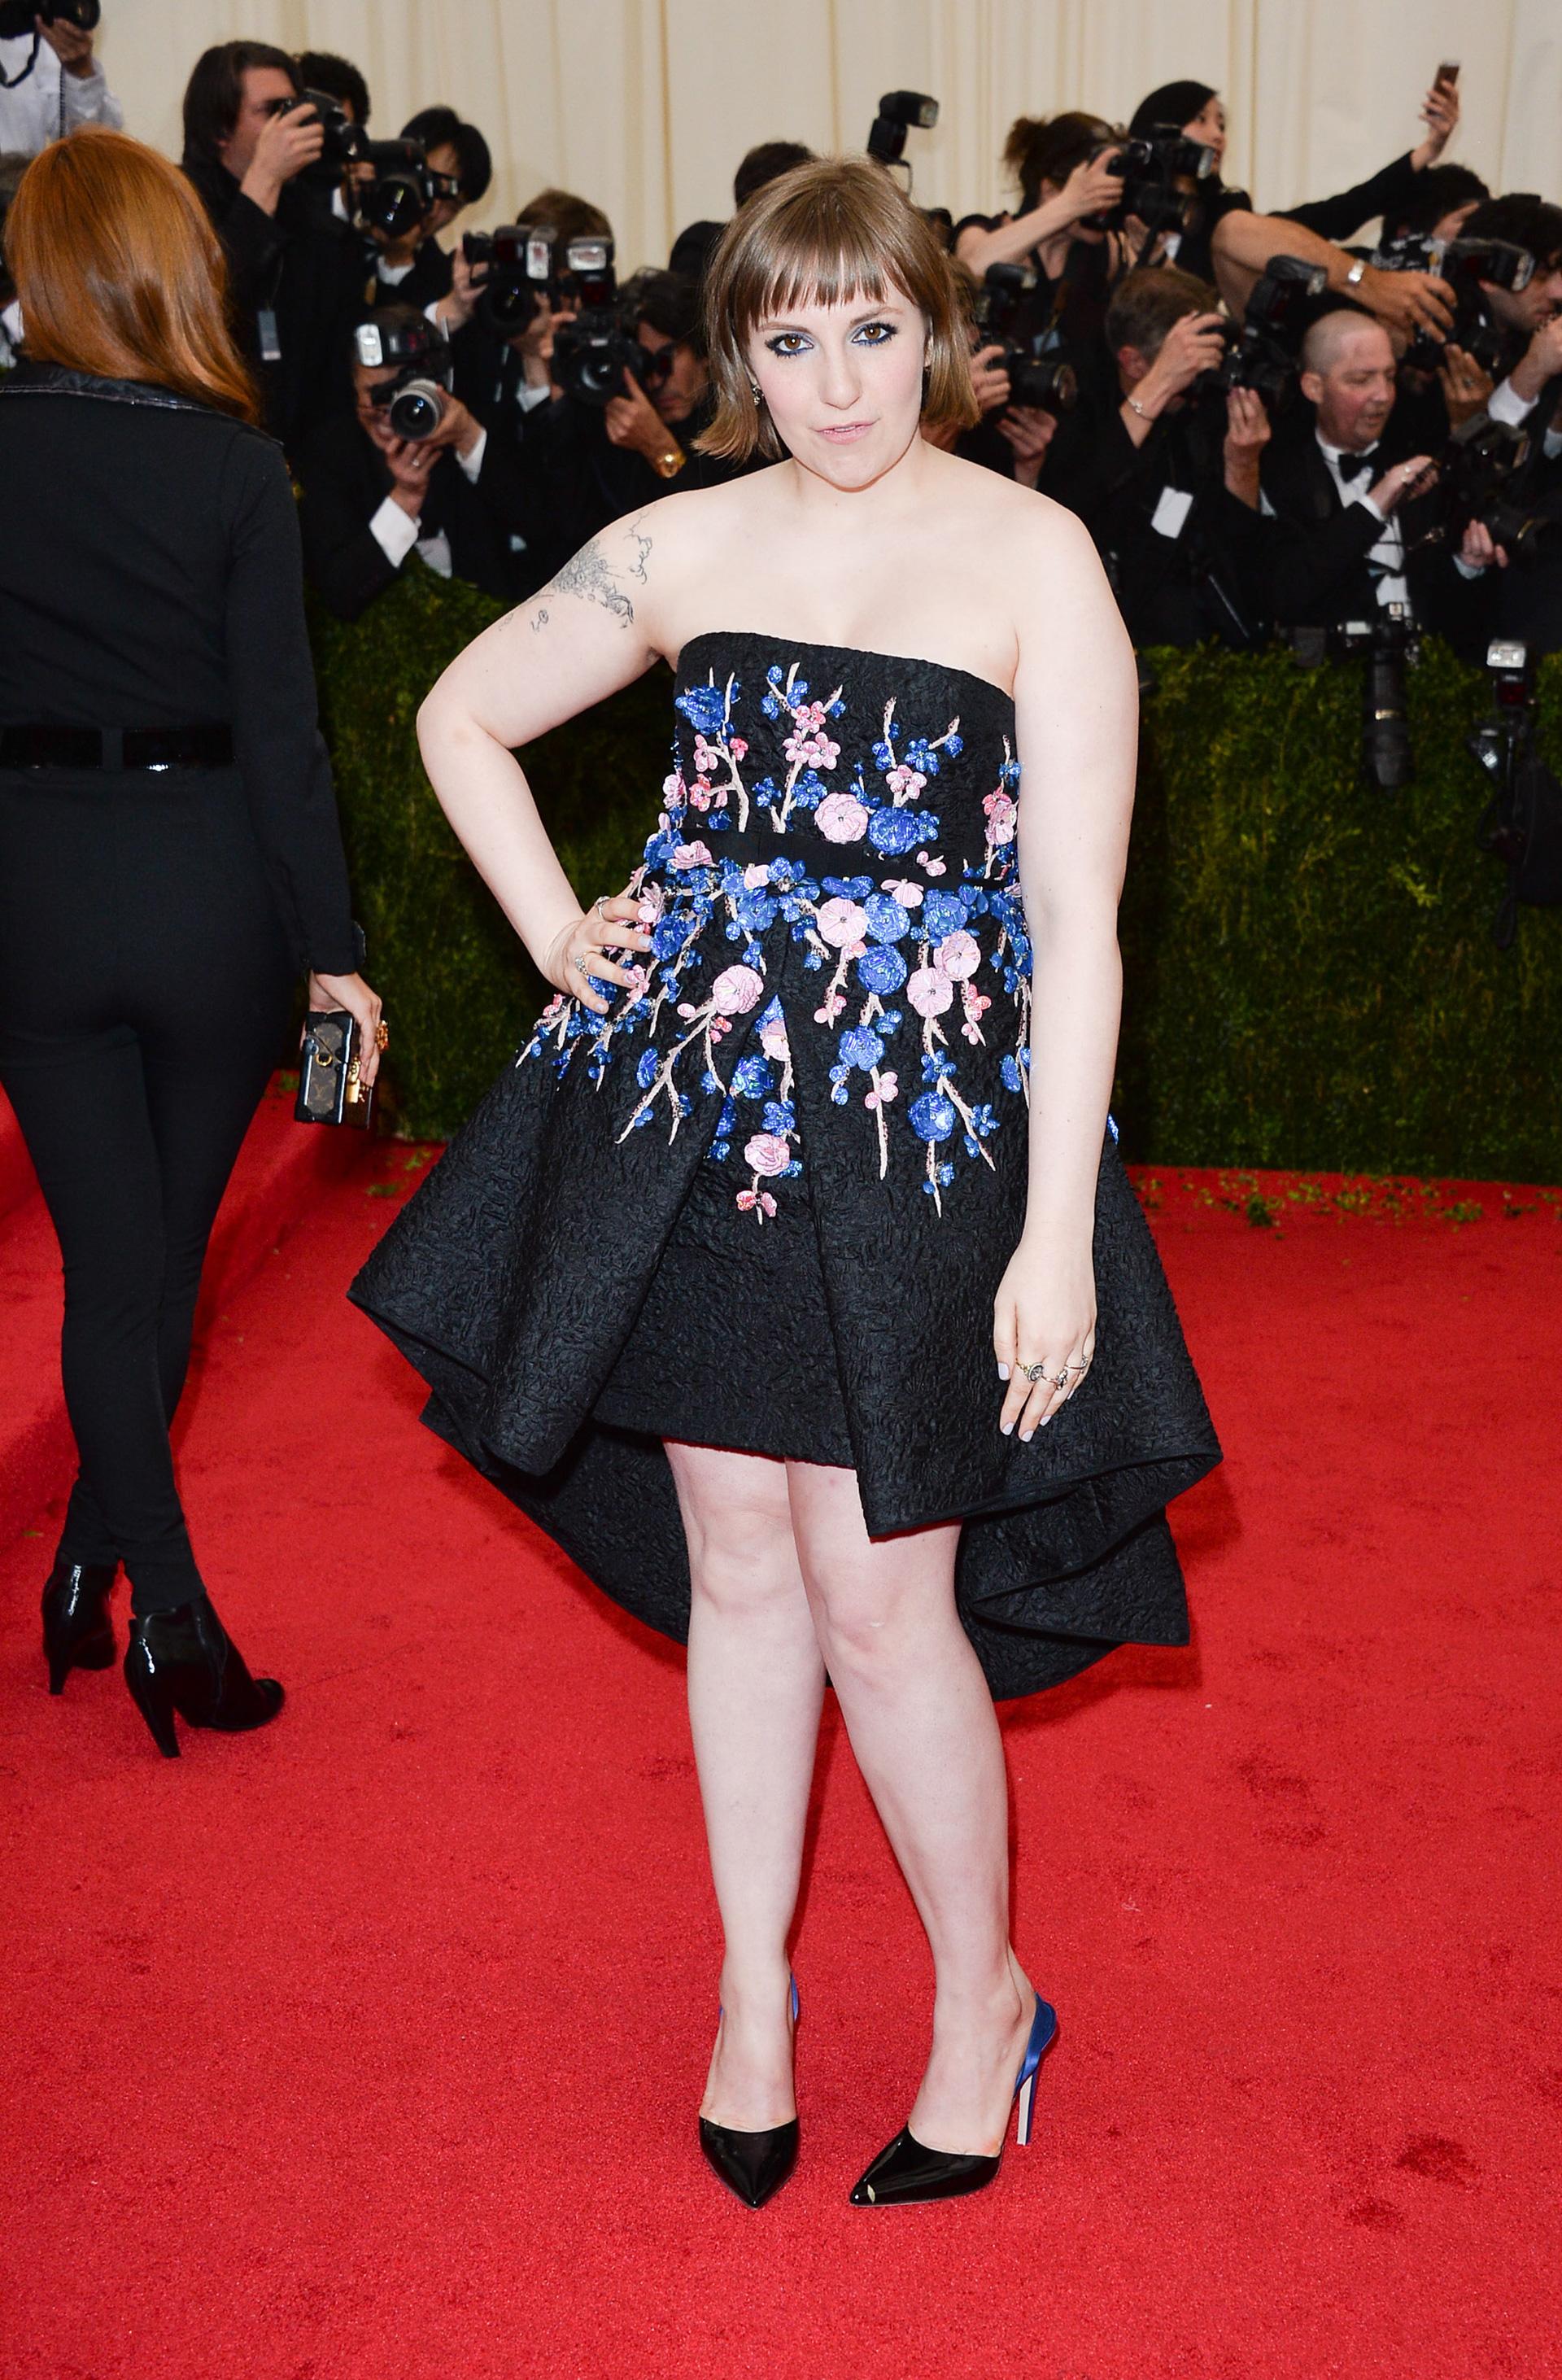 Lena Dunham: Creative fashionista